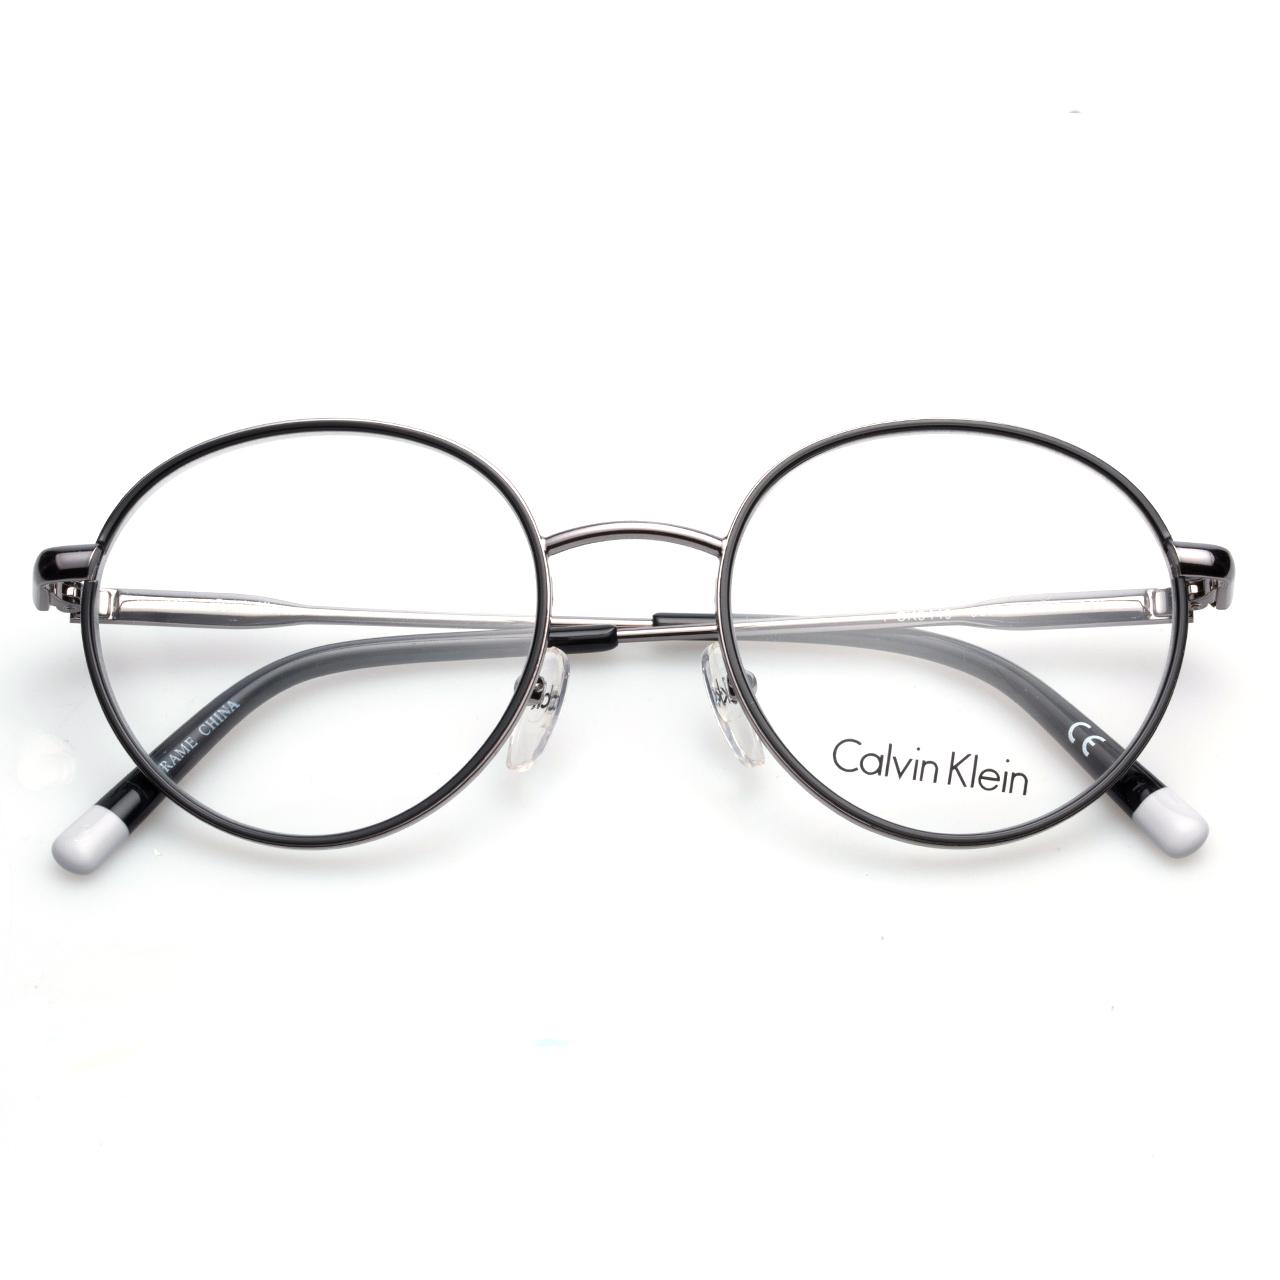 7437bf3ec0a ... CK glasses frame male retro round frame square face tide art myopia glasses  frame female treasure